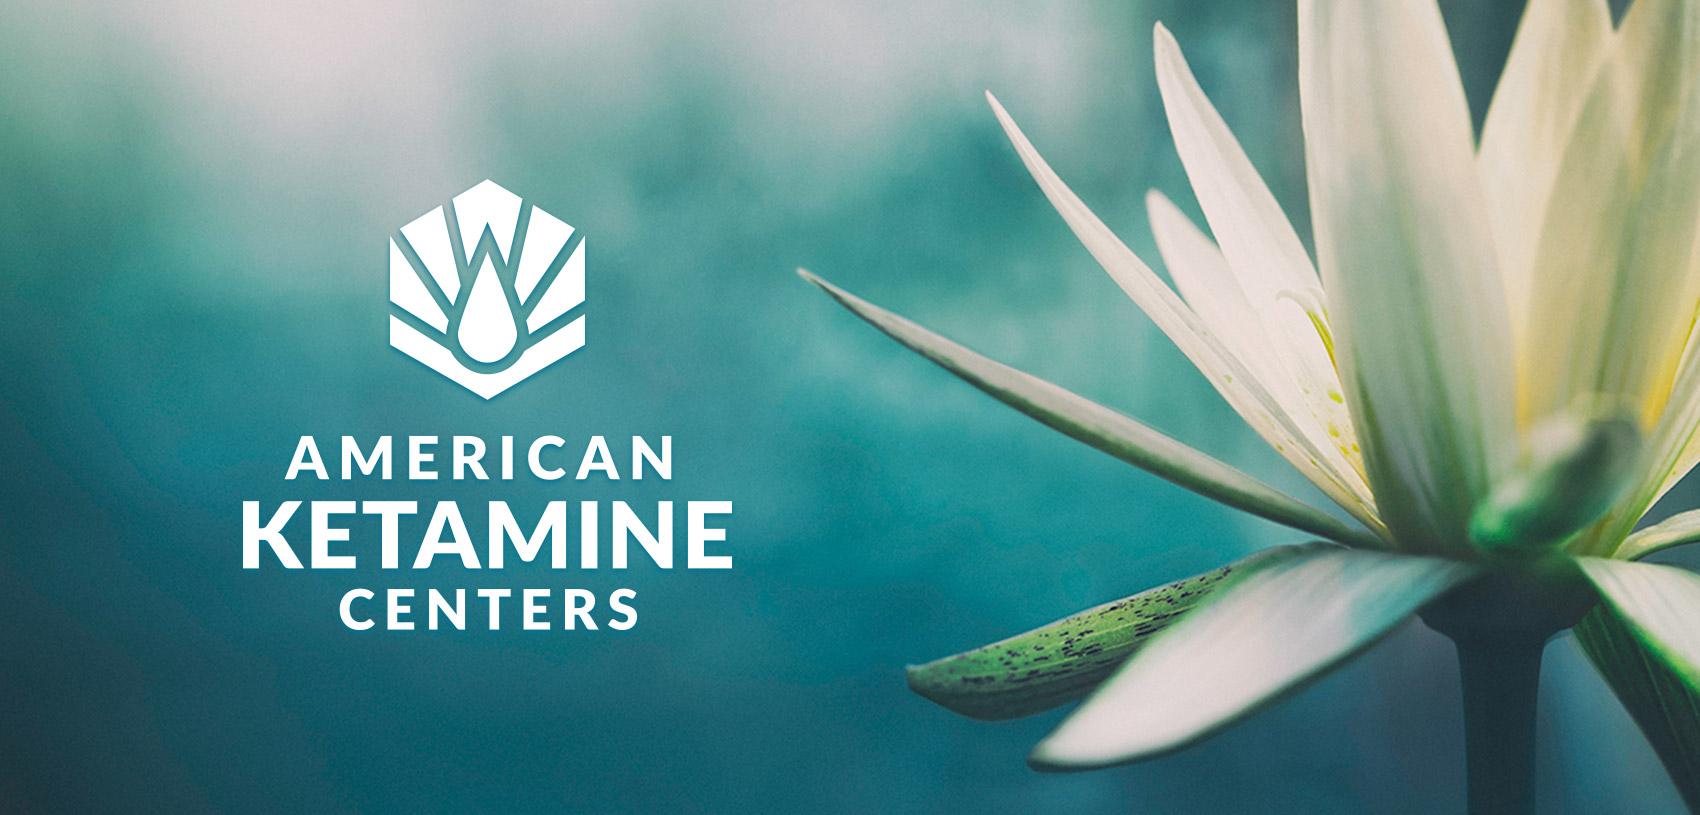 American Ketamine Centers